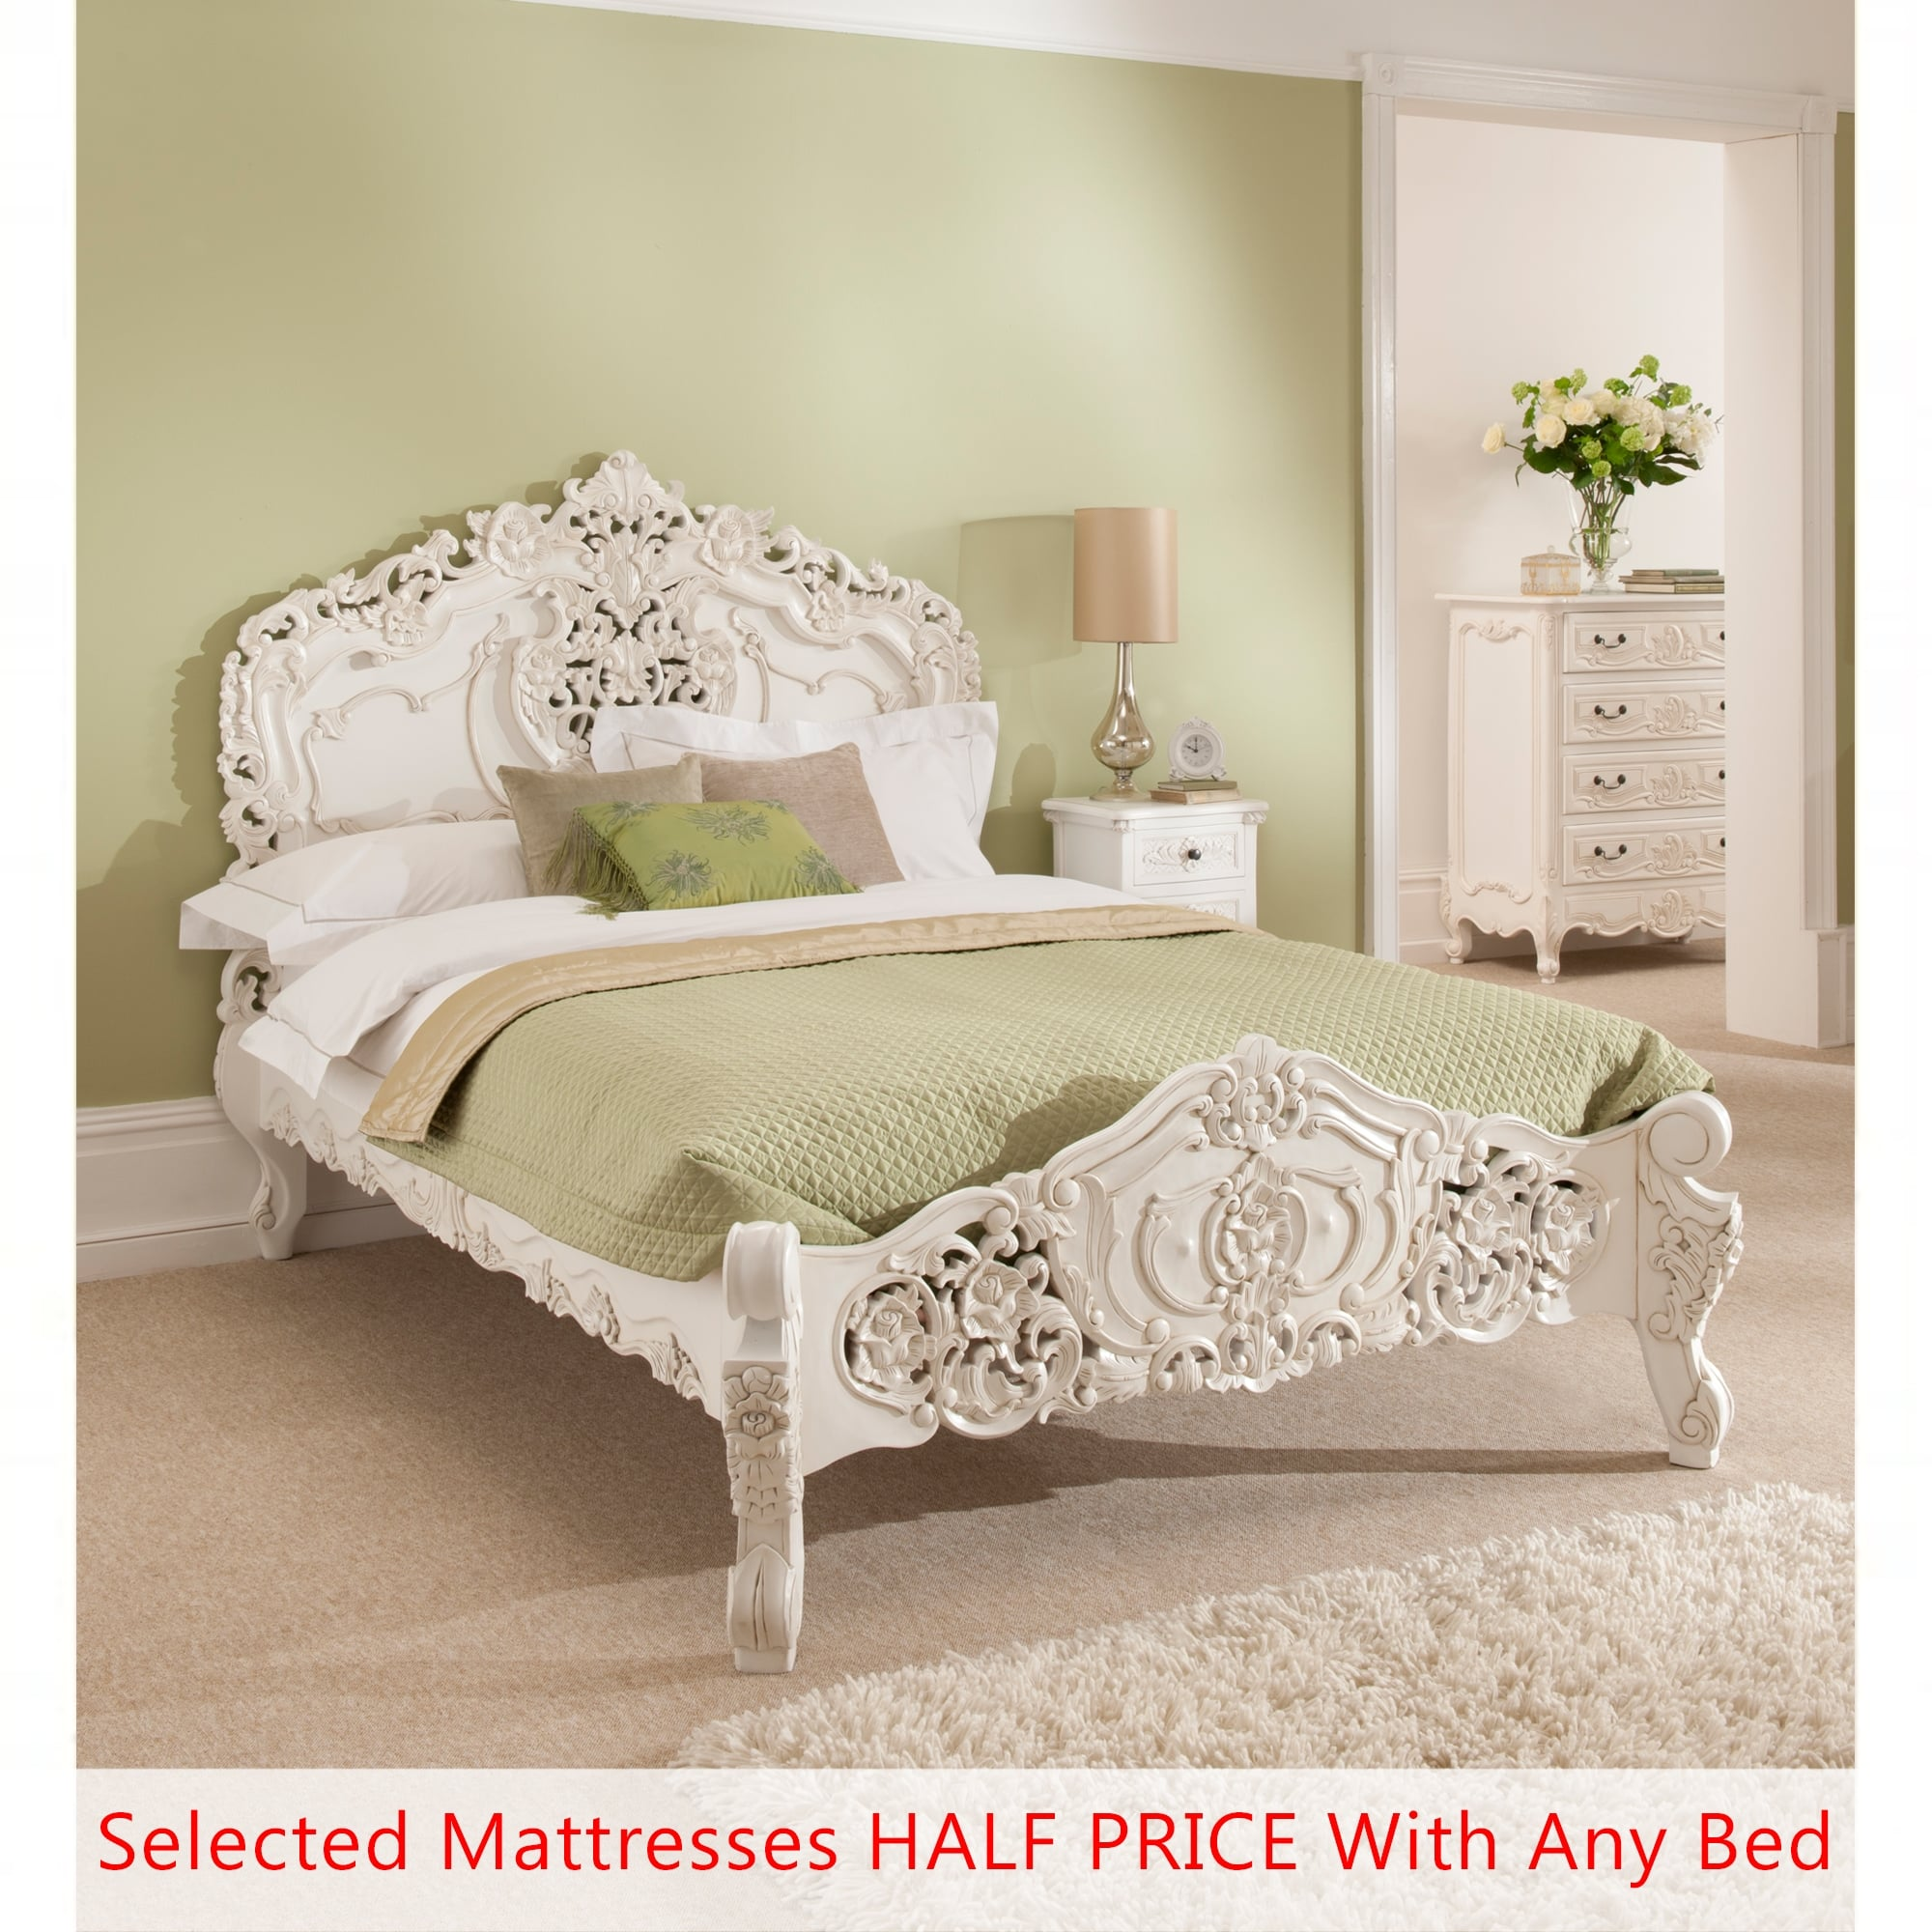 com mattress sealy king ip mattresses walmart plush bourdon